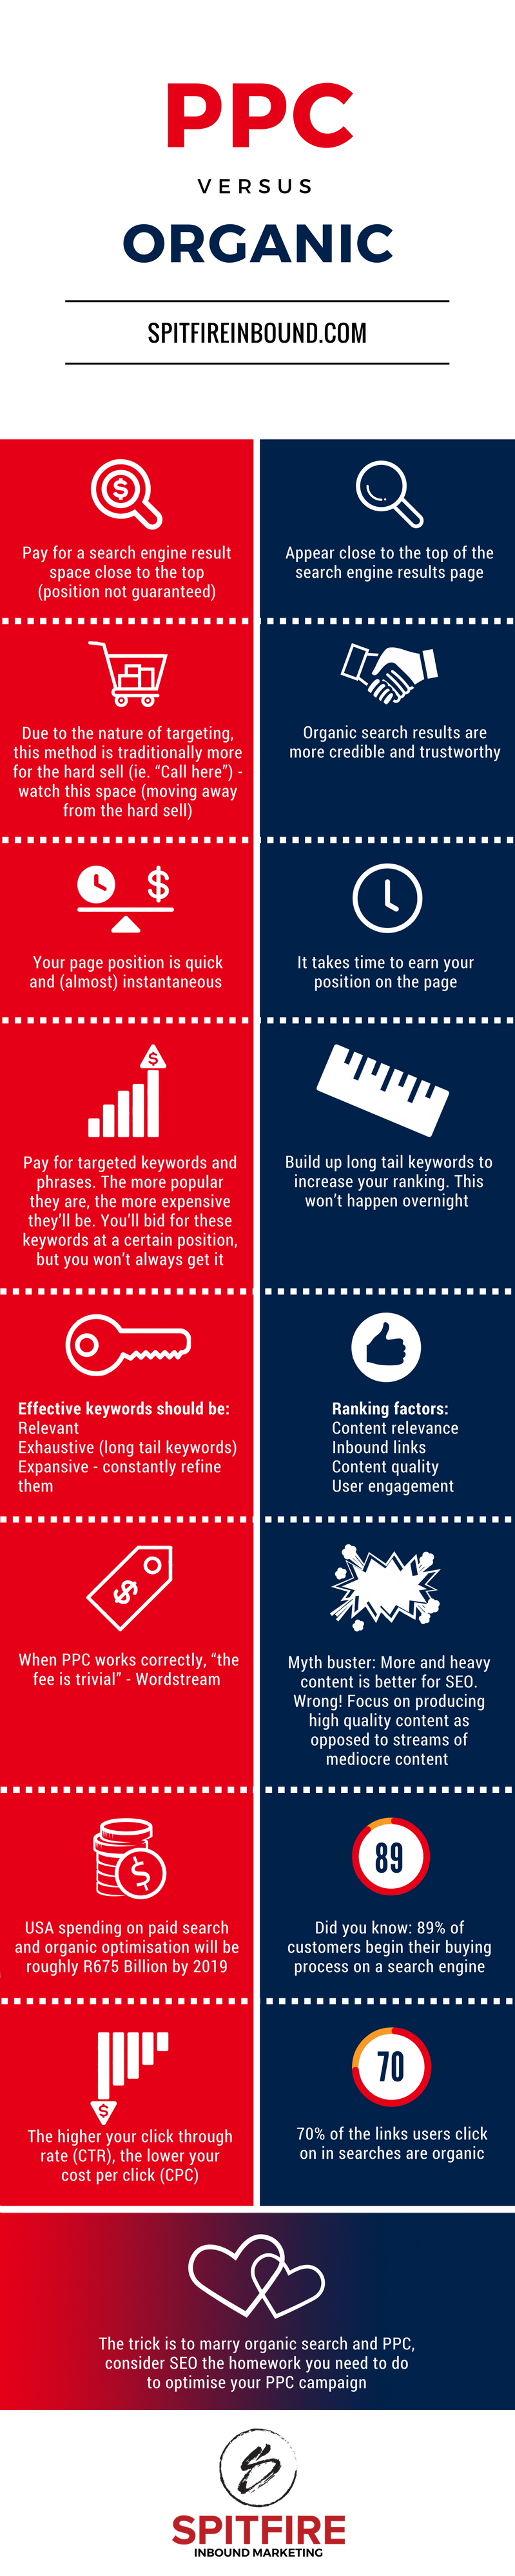 Spitfire Inbound Marketing | PPC vs. SEO Infographic